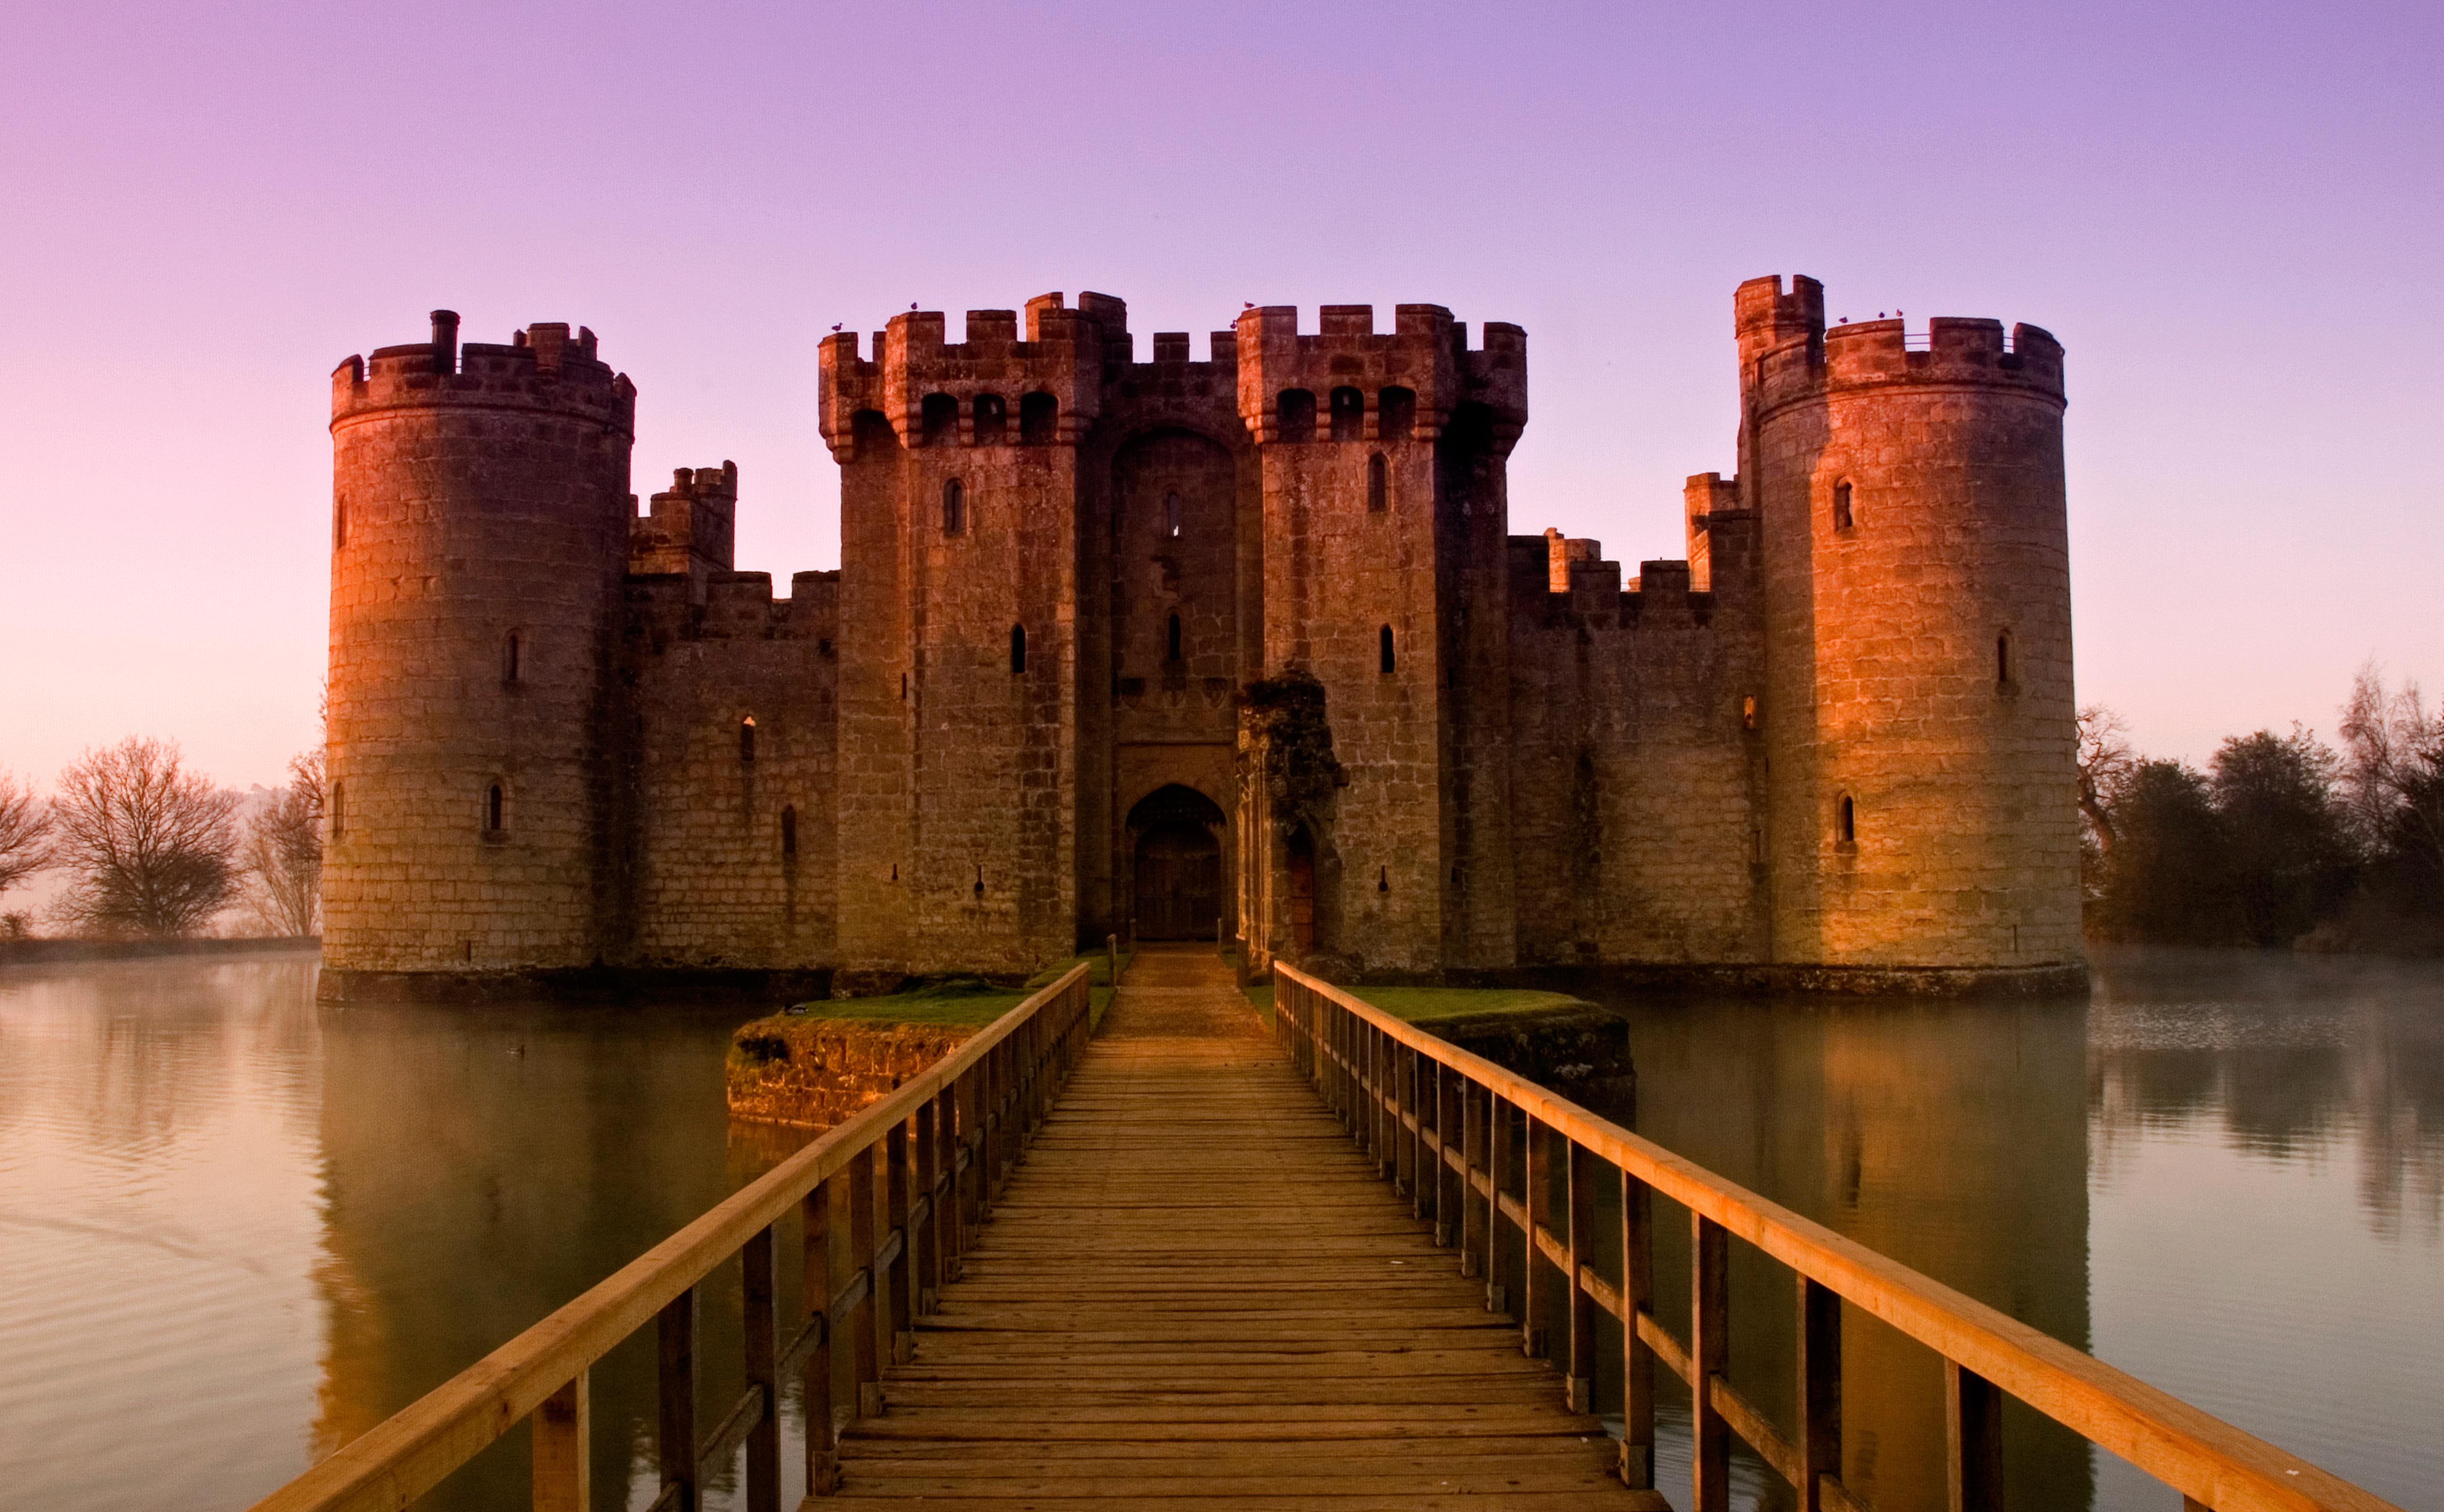 most impressive castles bodiam castle england